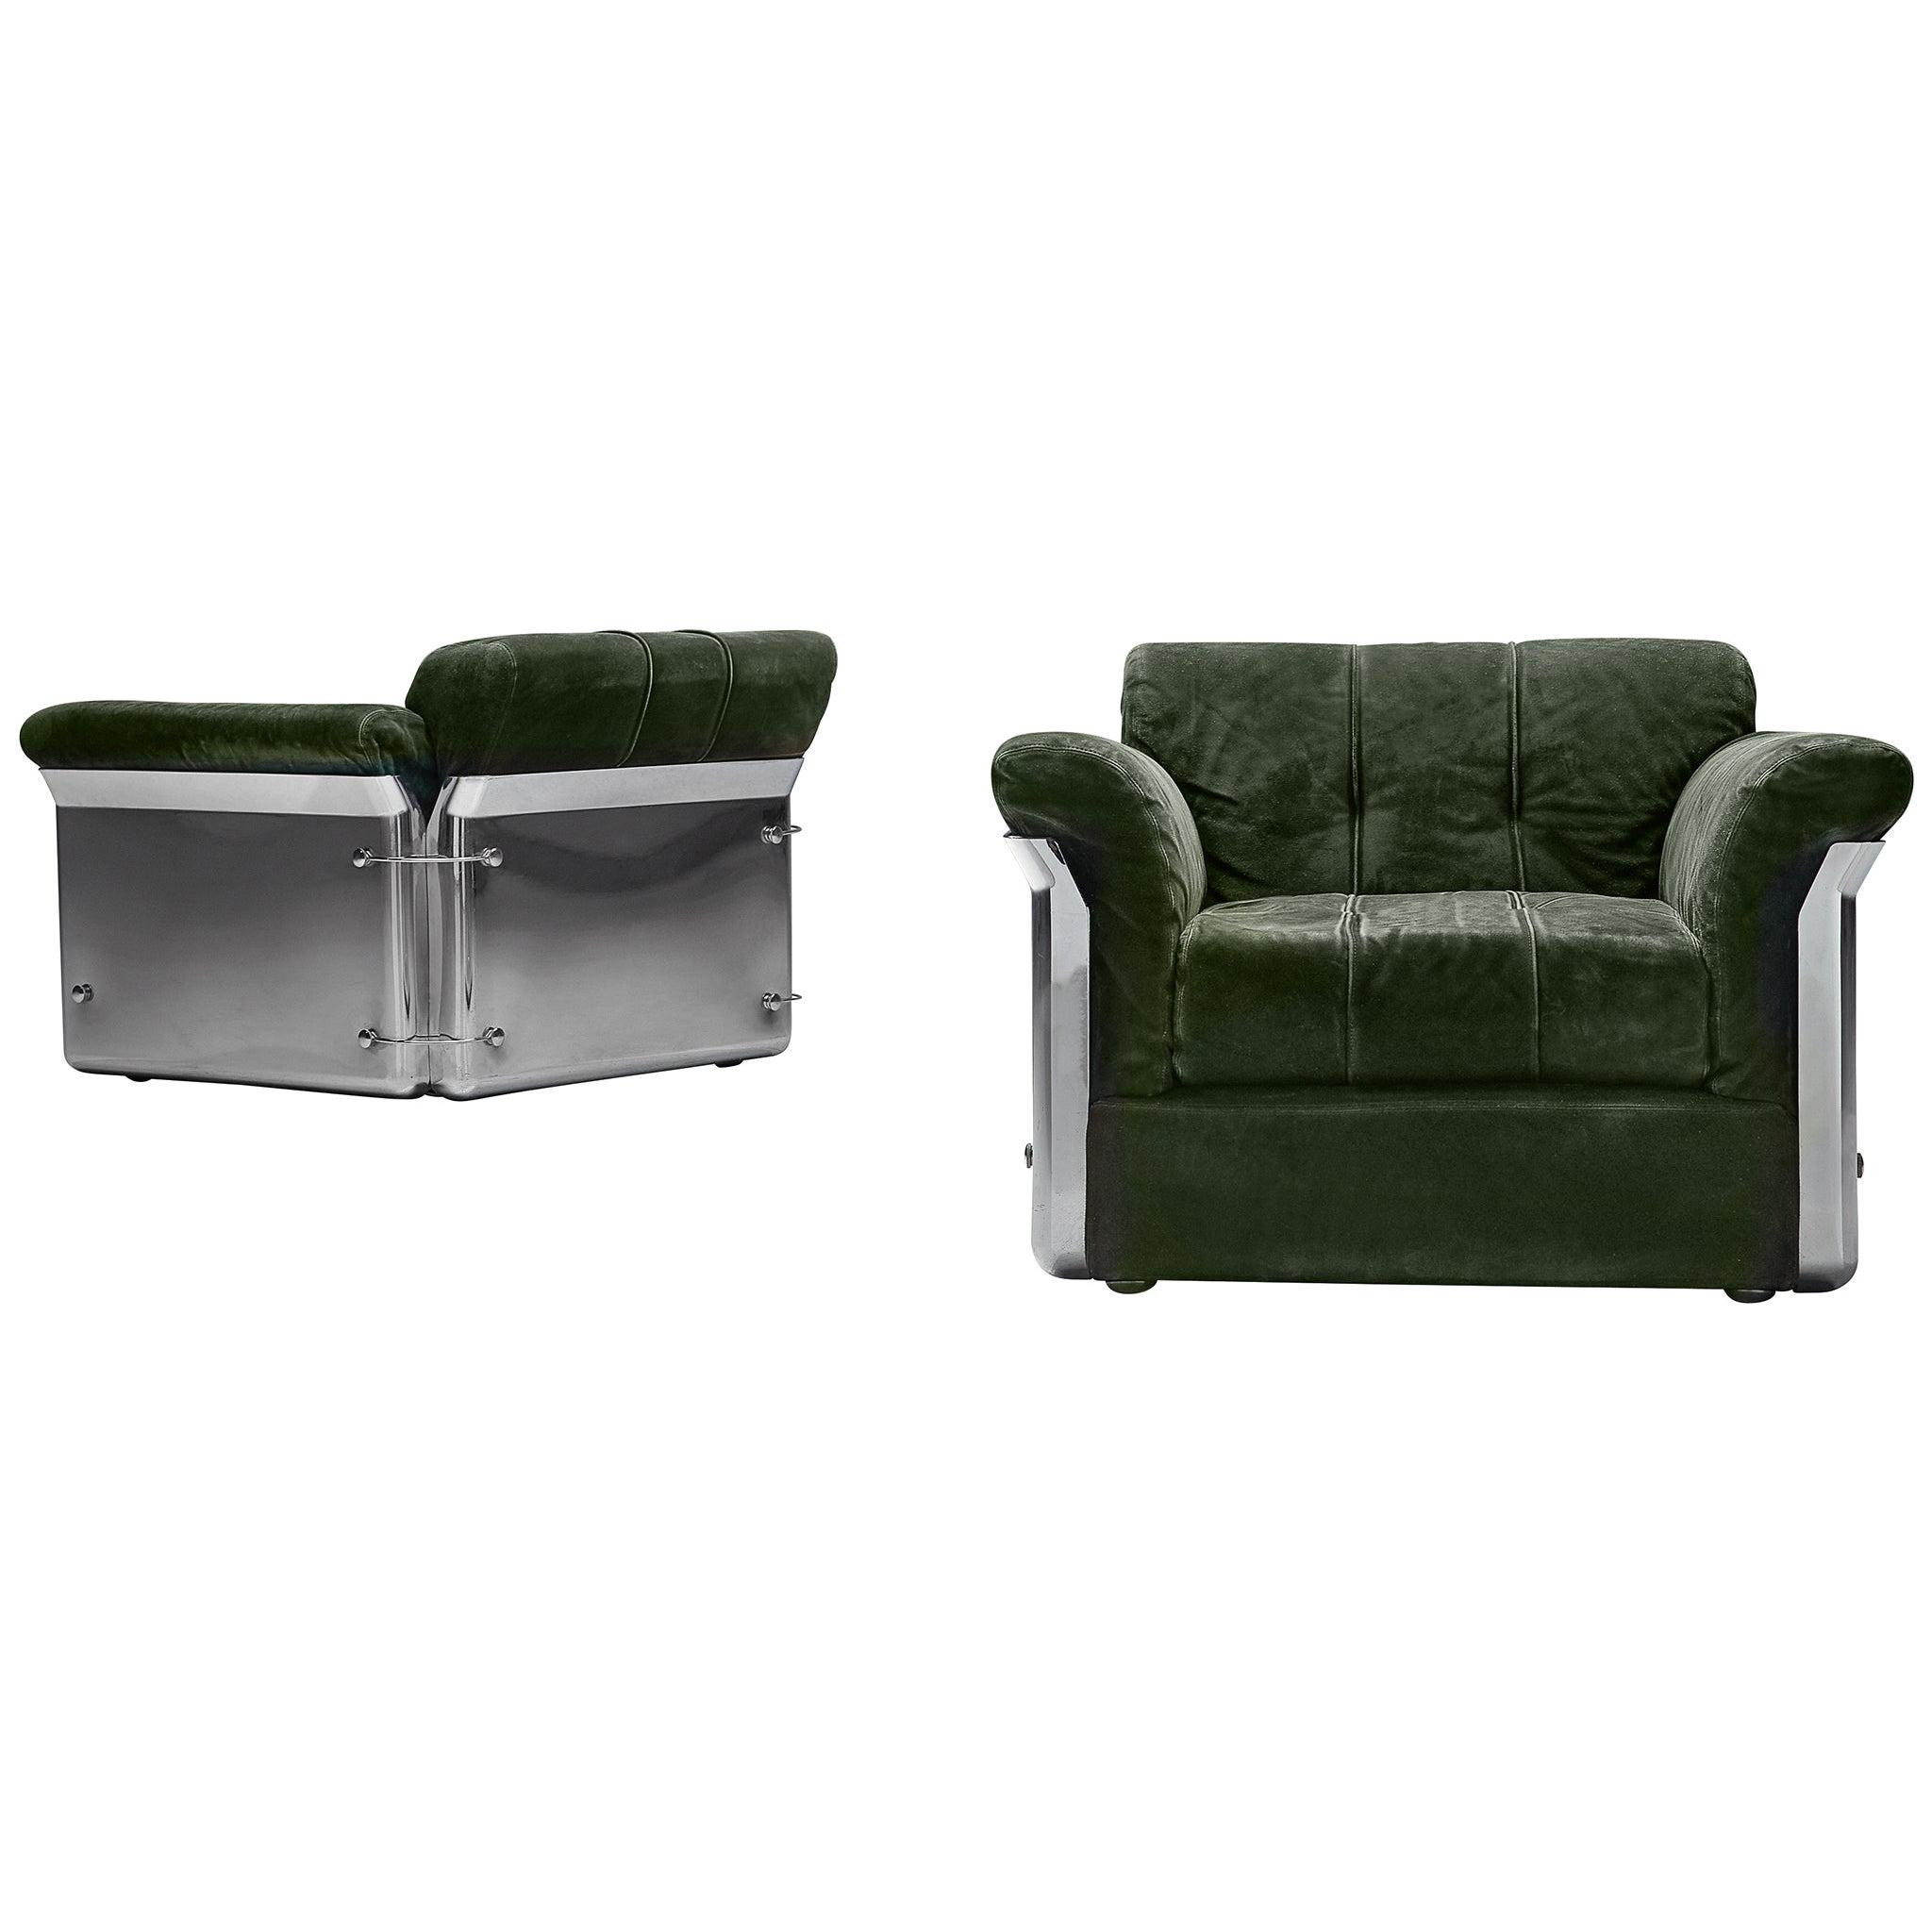 Vittorio Introini Pair of 'Larissa' Lounge Chairs